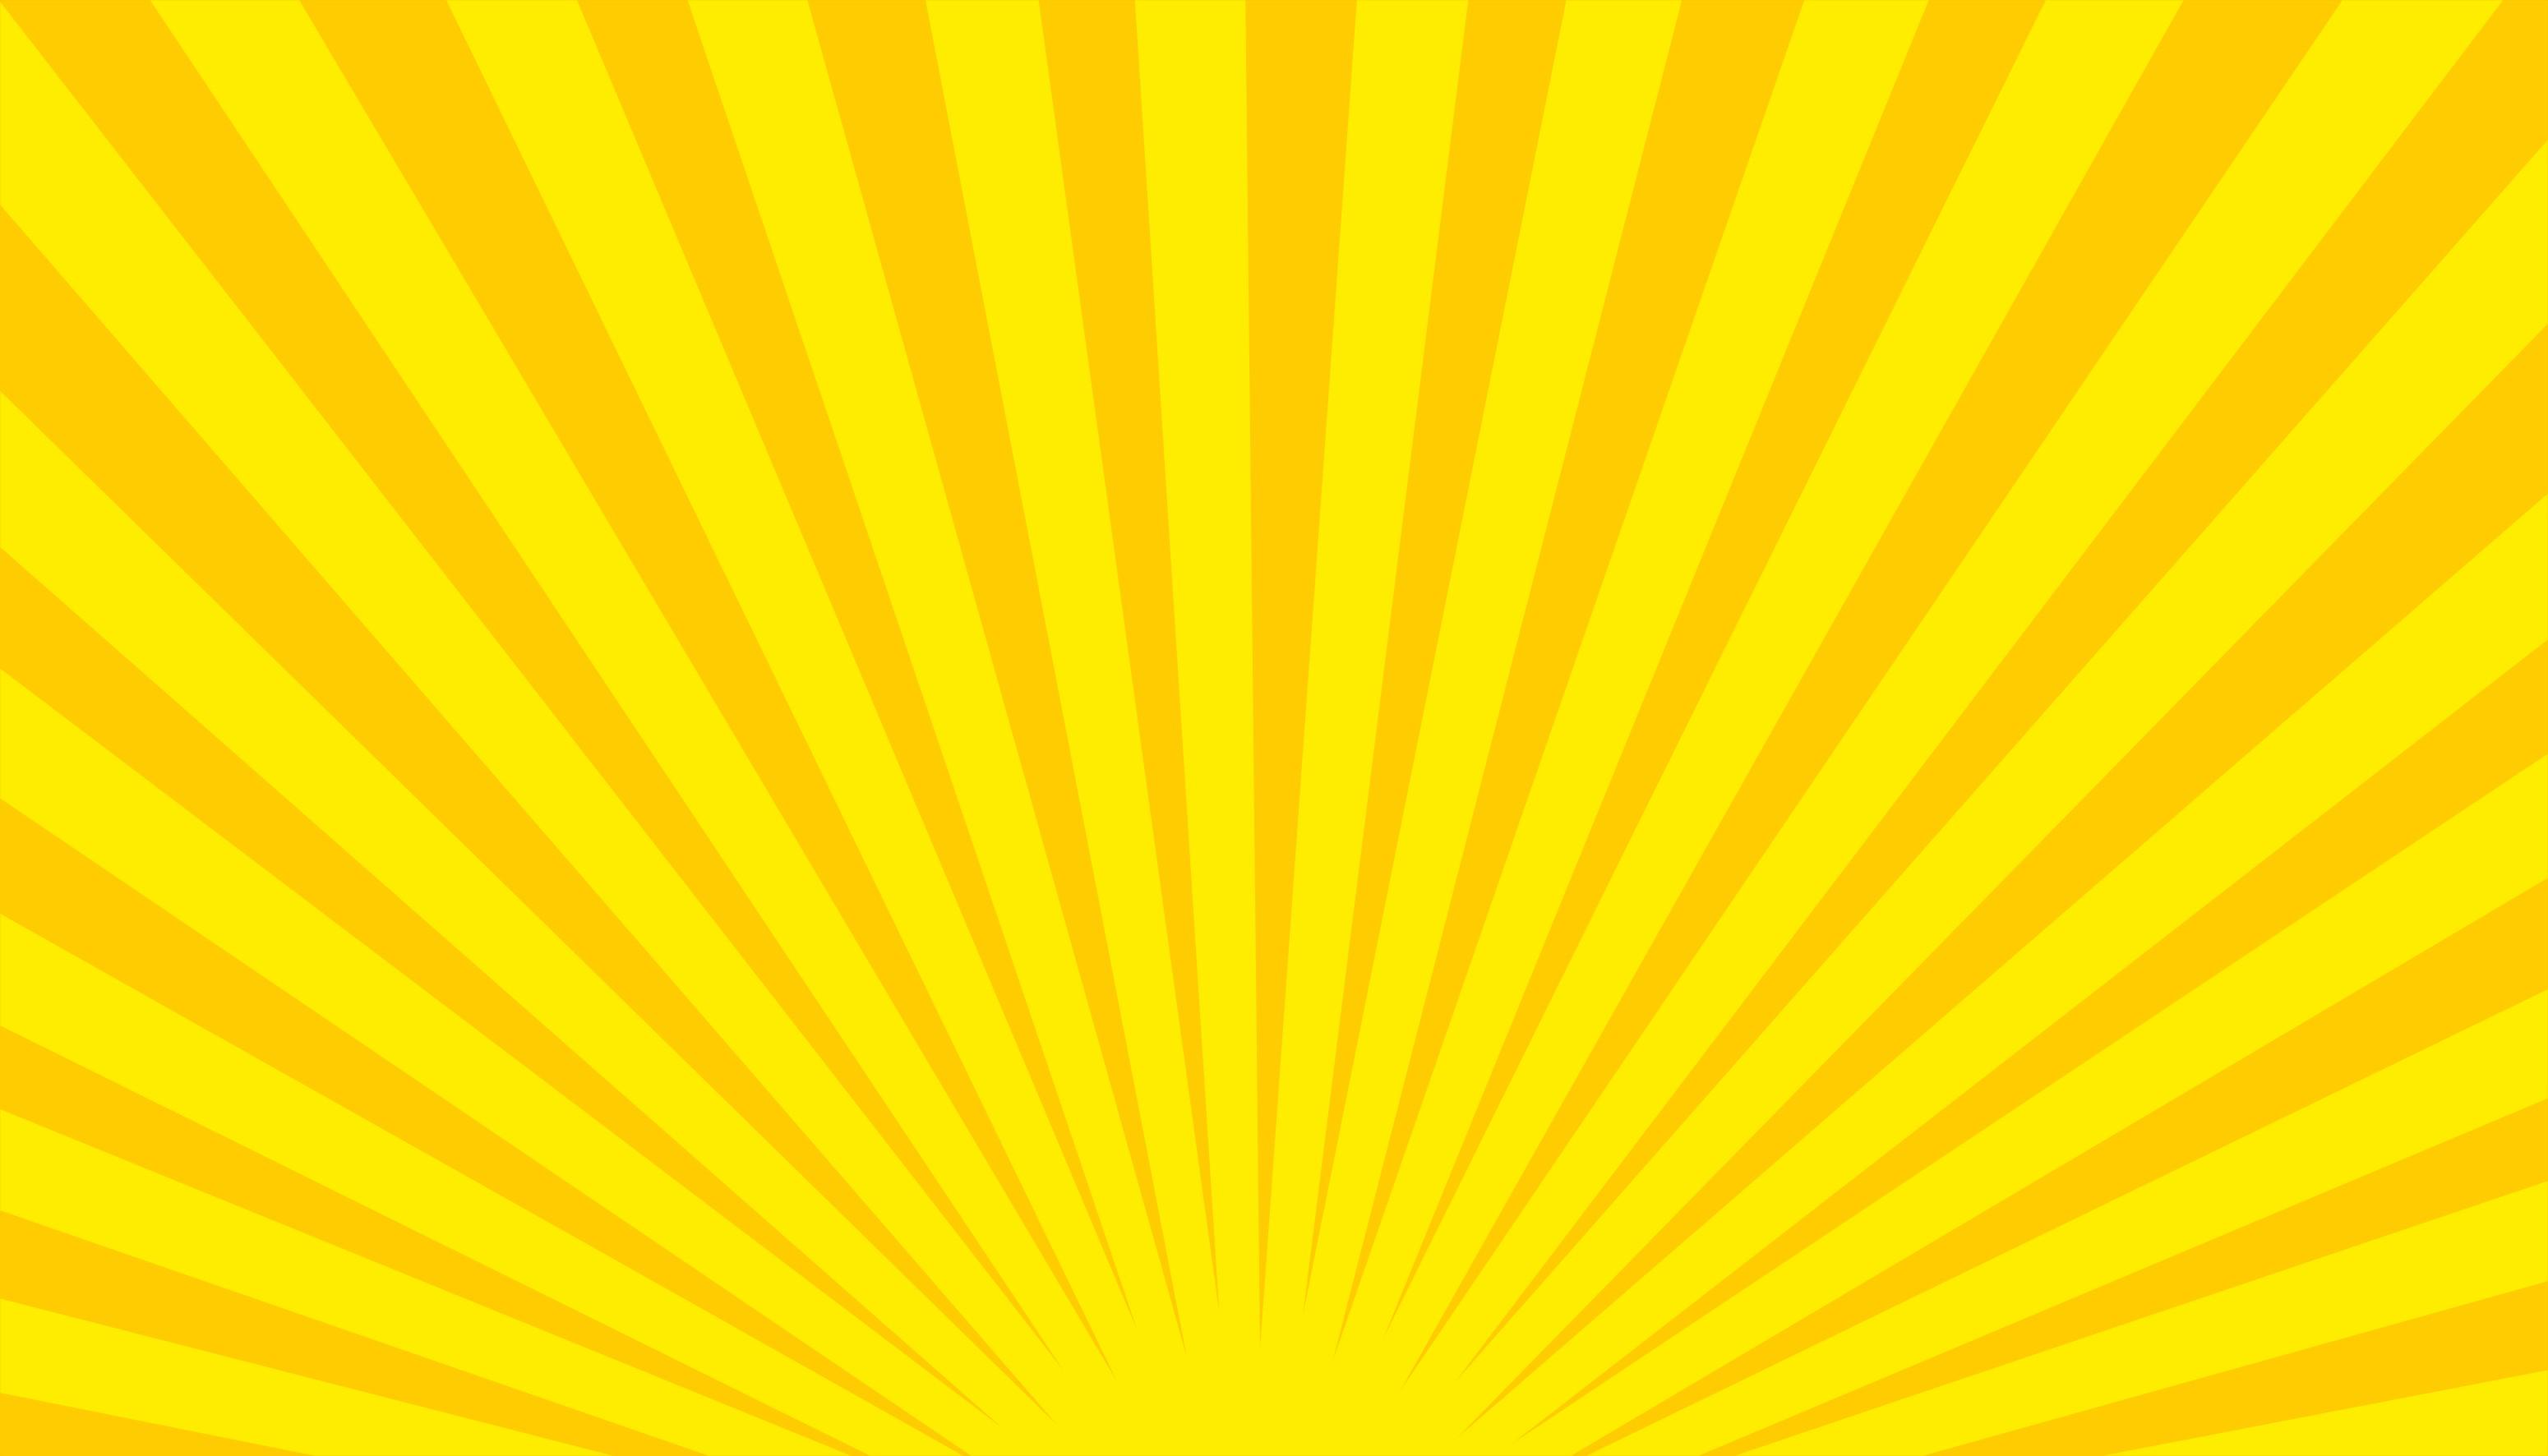 Create meme background sunburst beige yellow background 3100x1772